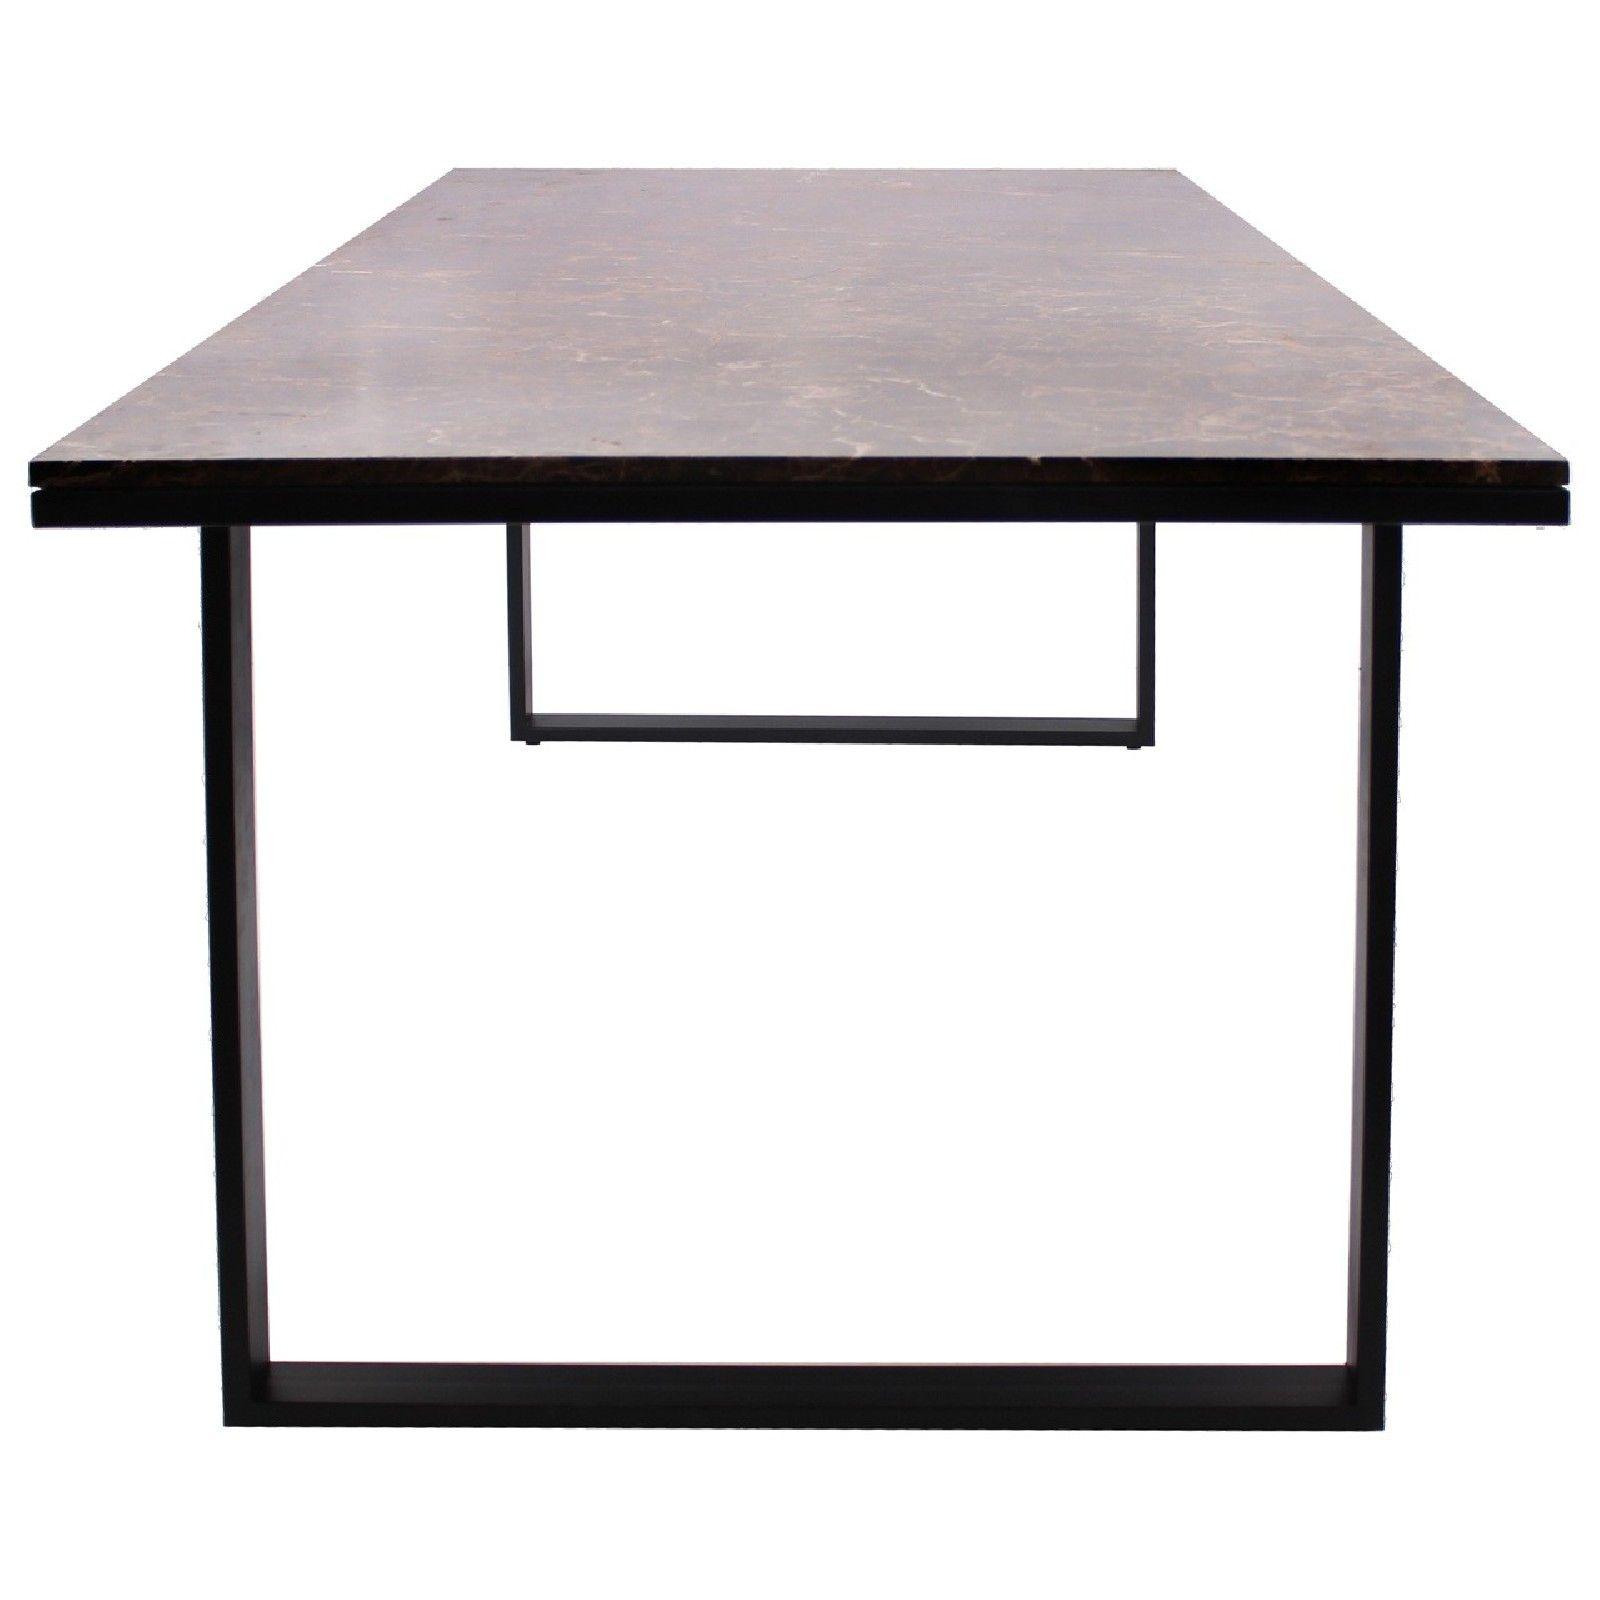 Table à dîner Dalton brown emperador 230x94 Meuble Déco Tendance - 828